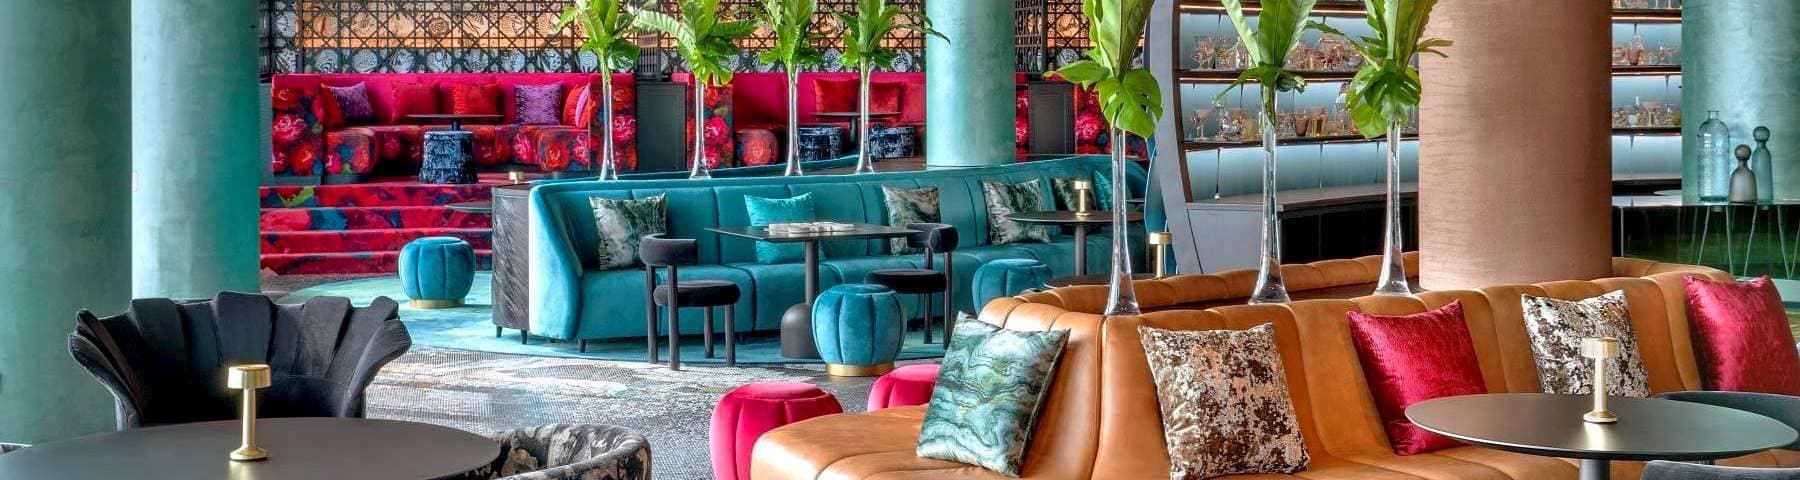 W Lounge